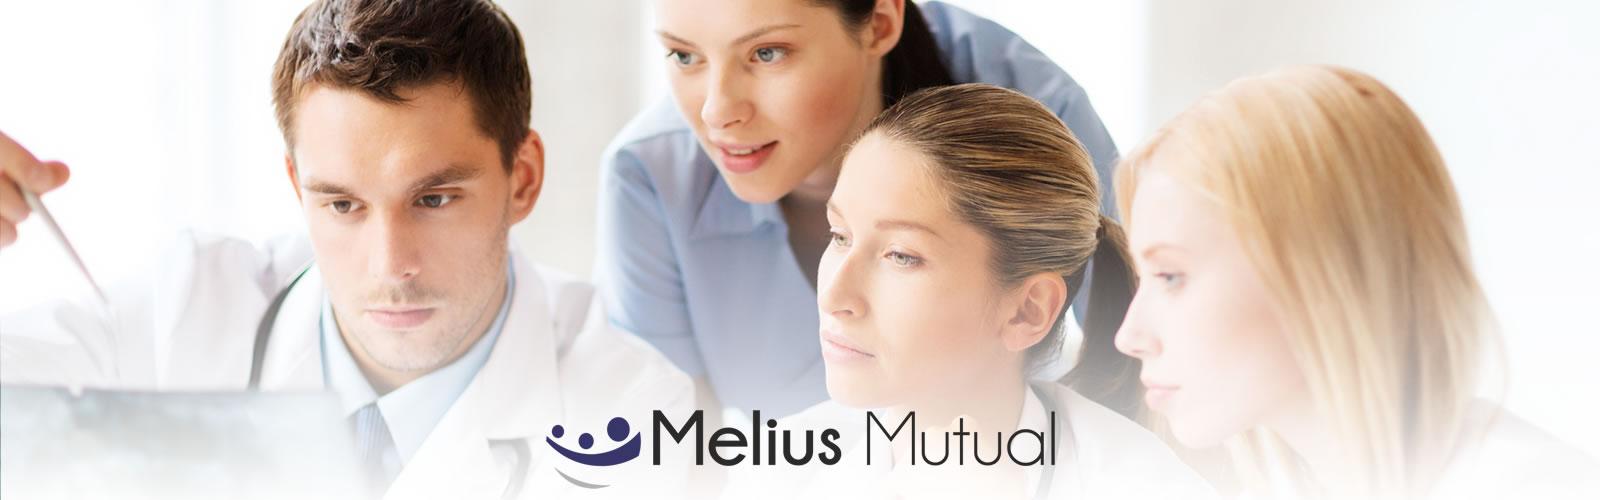 Melius Mutual